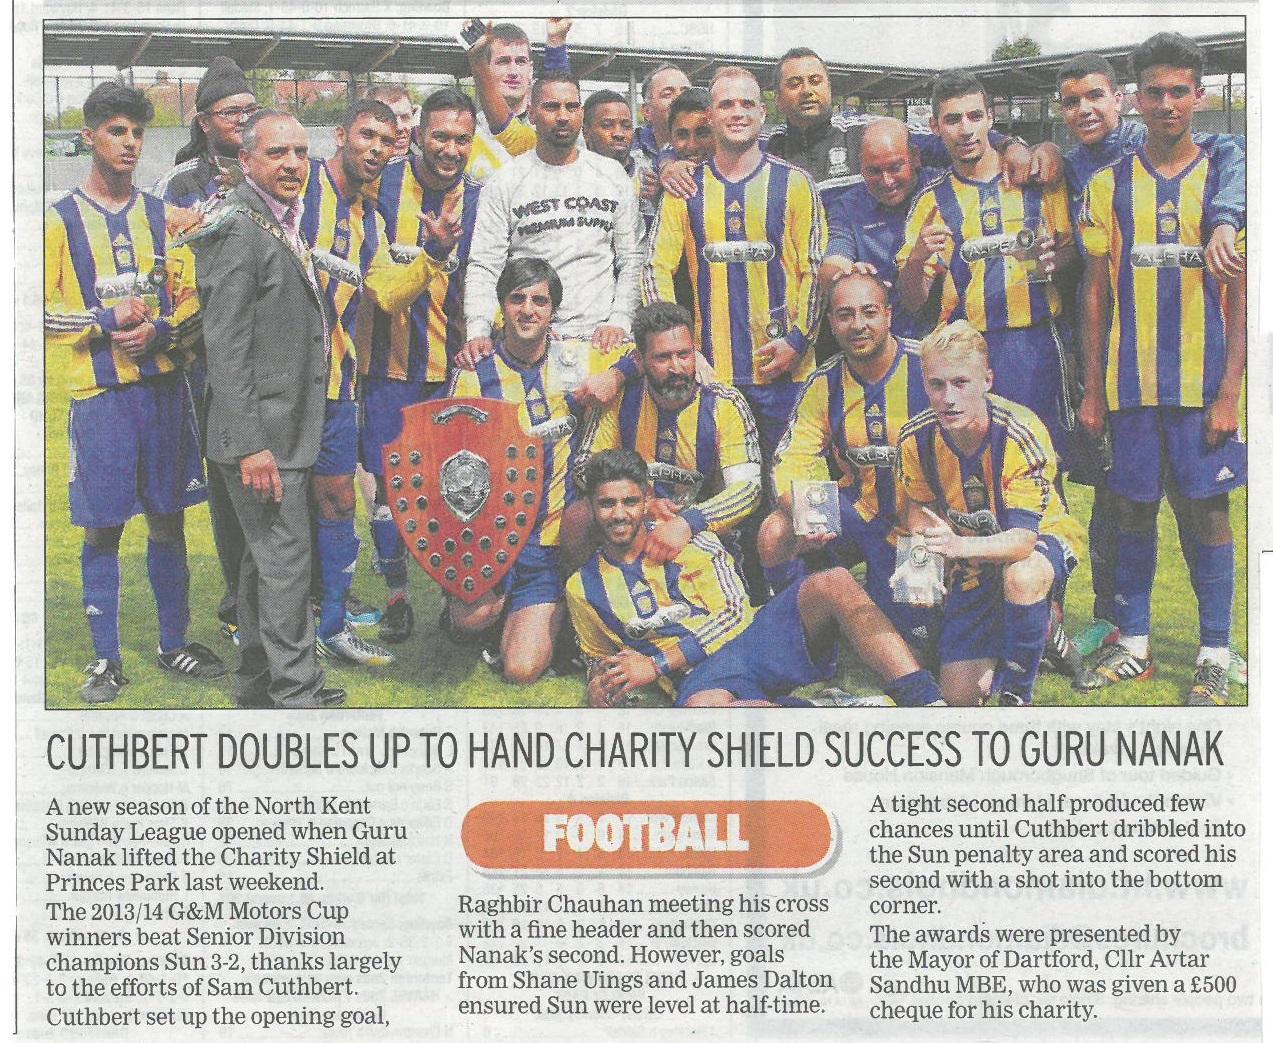 The Messenger - NKSL Charity Shield Winners 2014